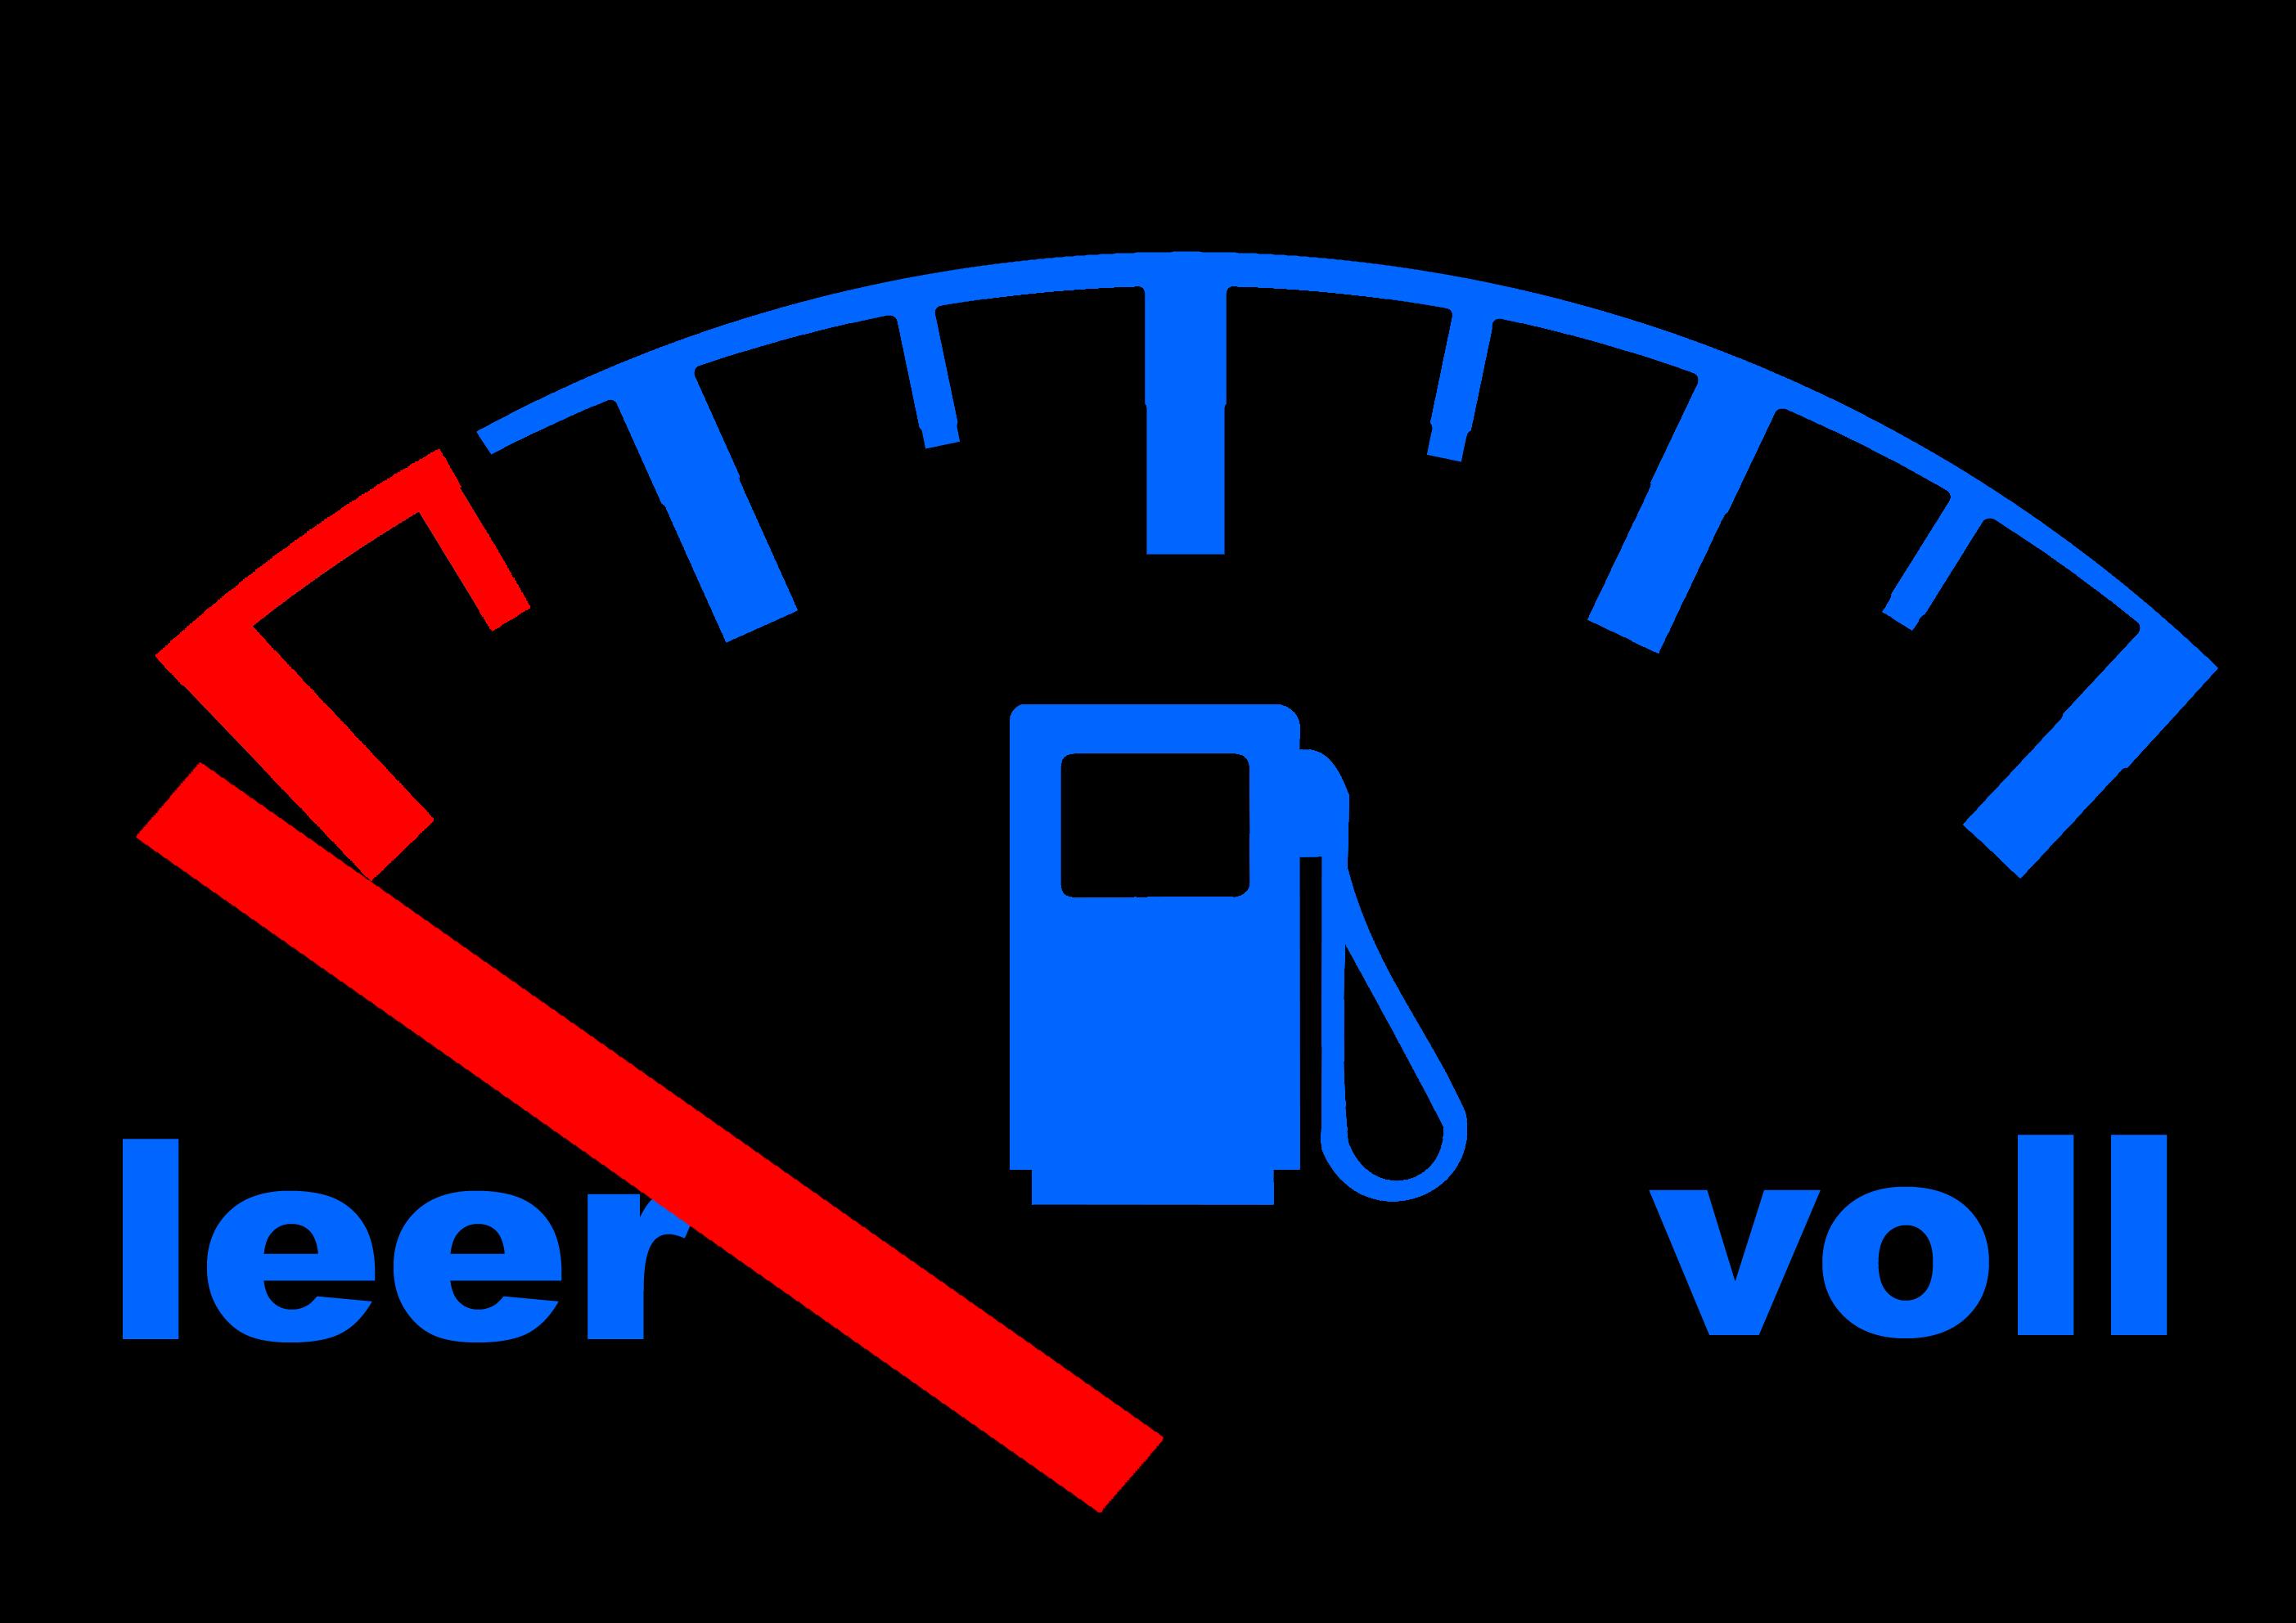 Billige autoversicherung fur fahranfanger